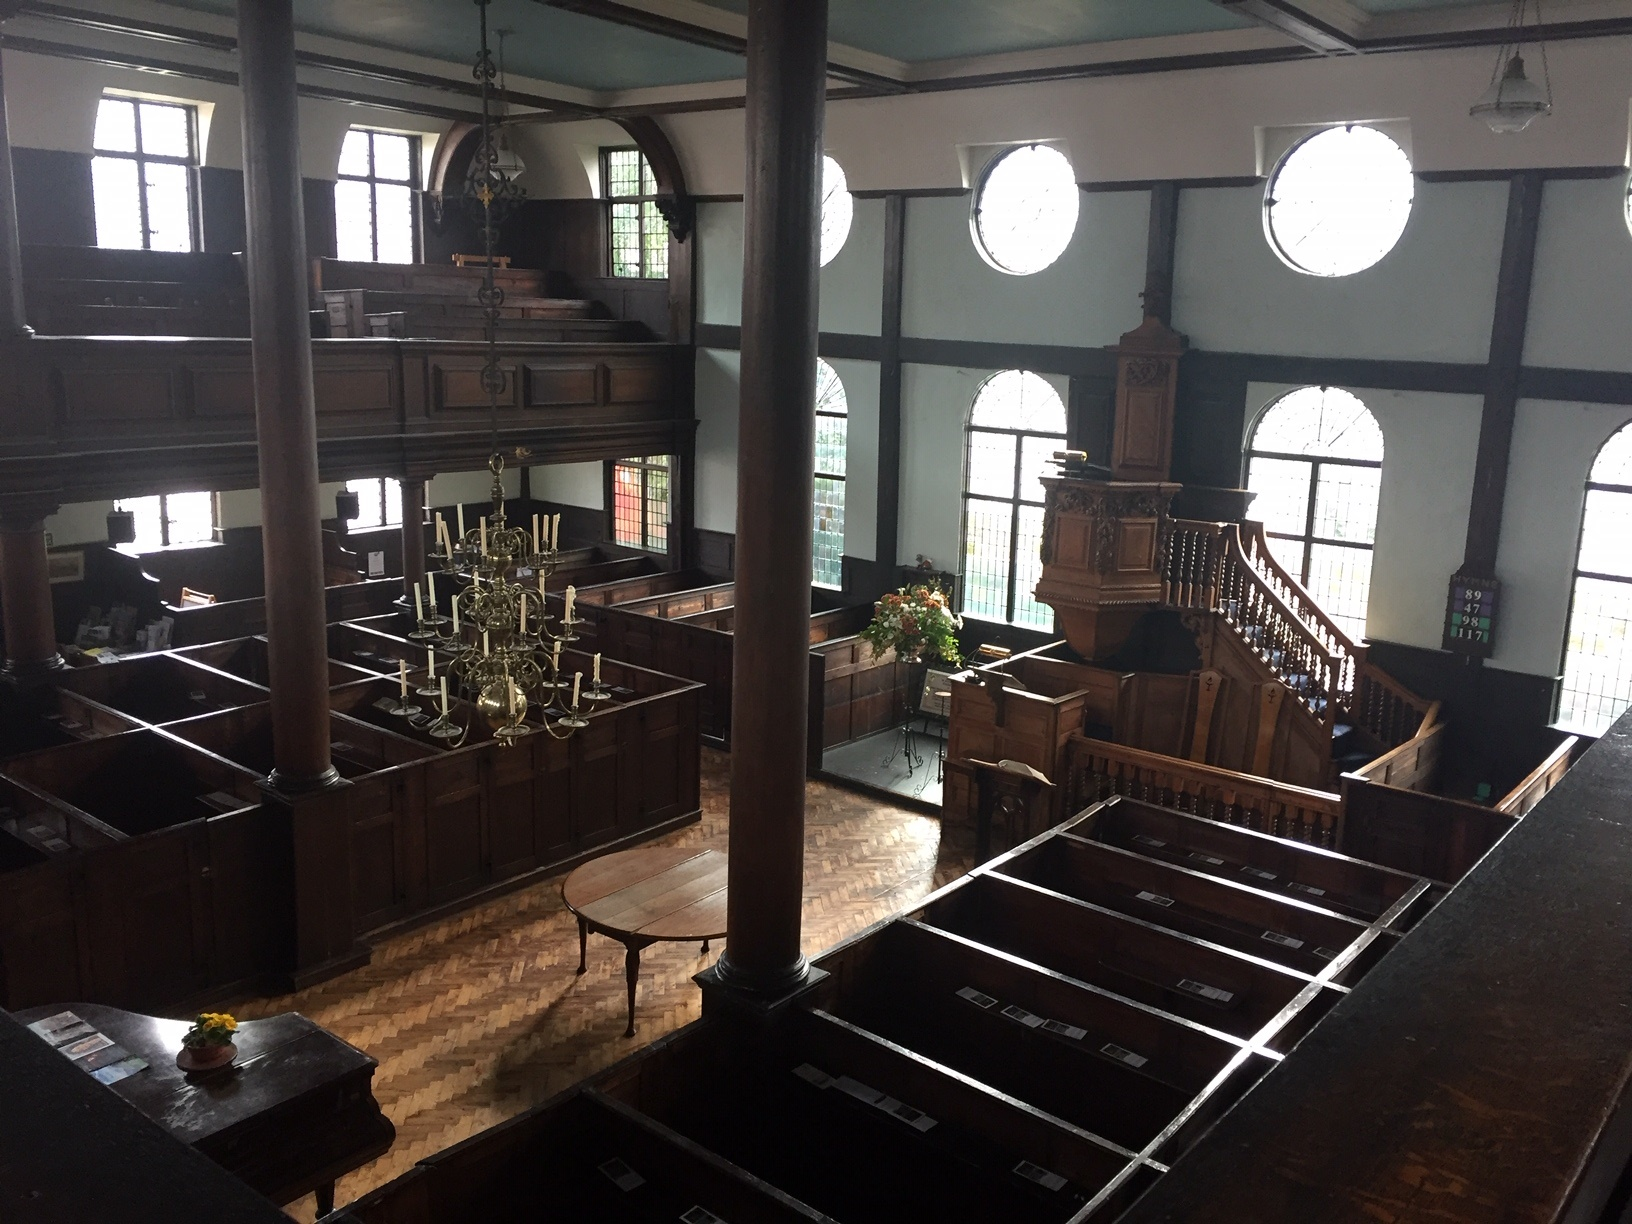 Ipswich Unitarian Meeting House 2(Credit church)